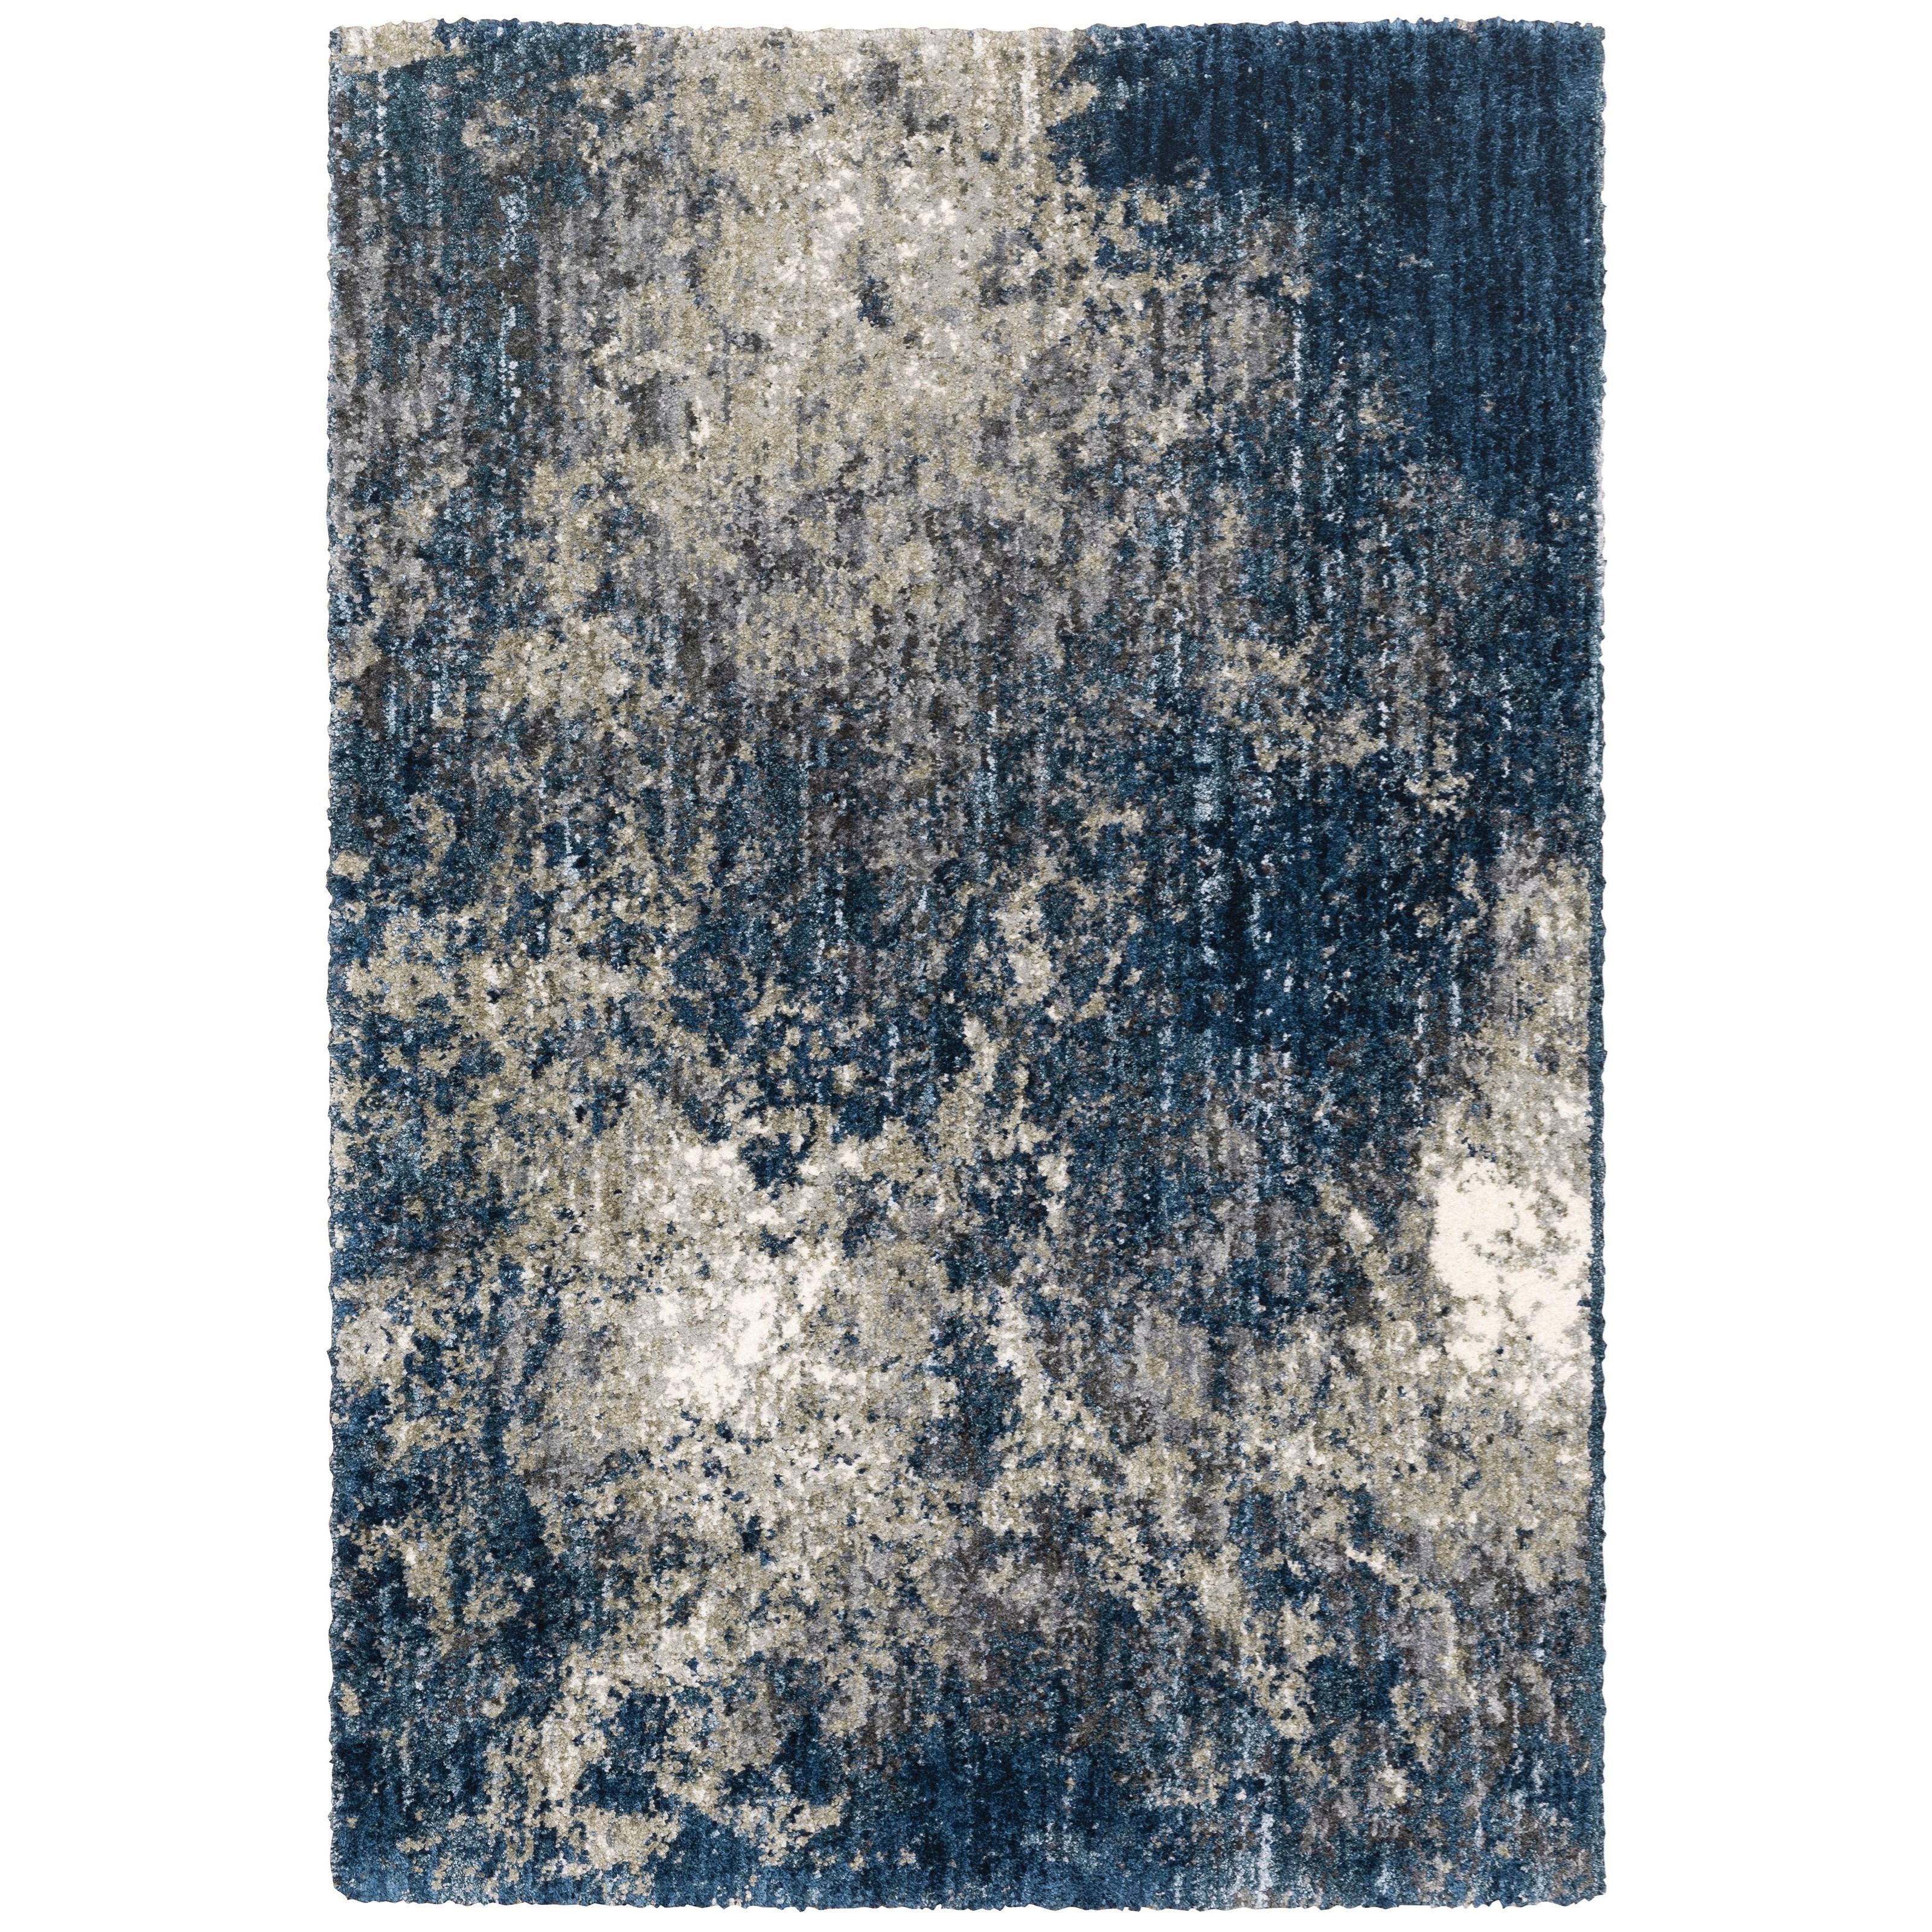 "ASPEN 2' 3"" X  7' 6"" Runner Rug by Oriental Weavers at Darvin Furniture"